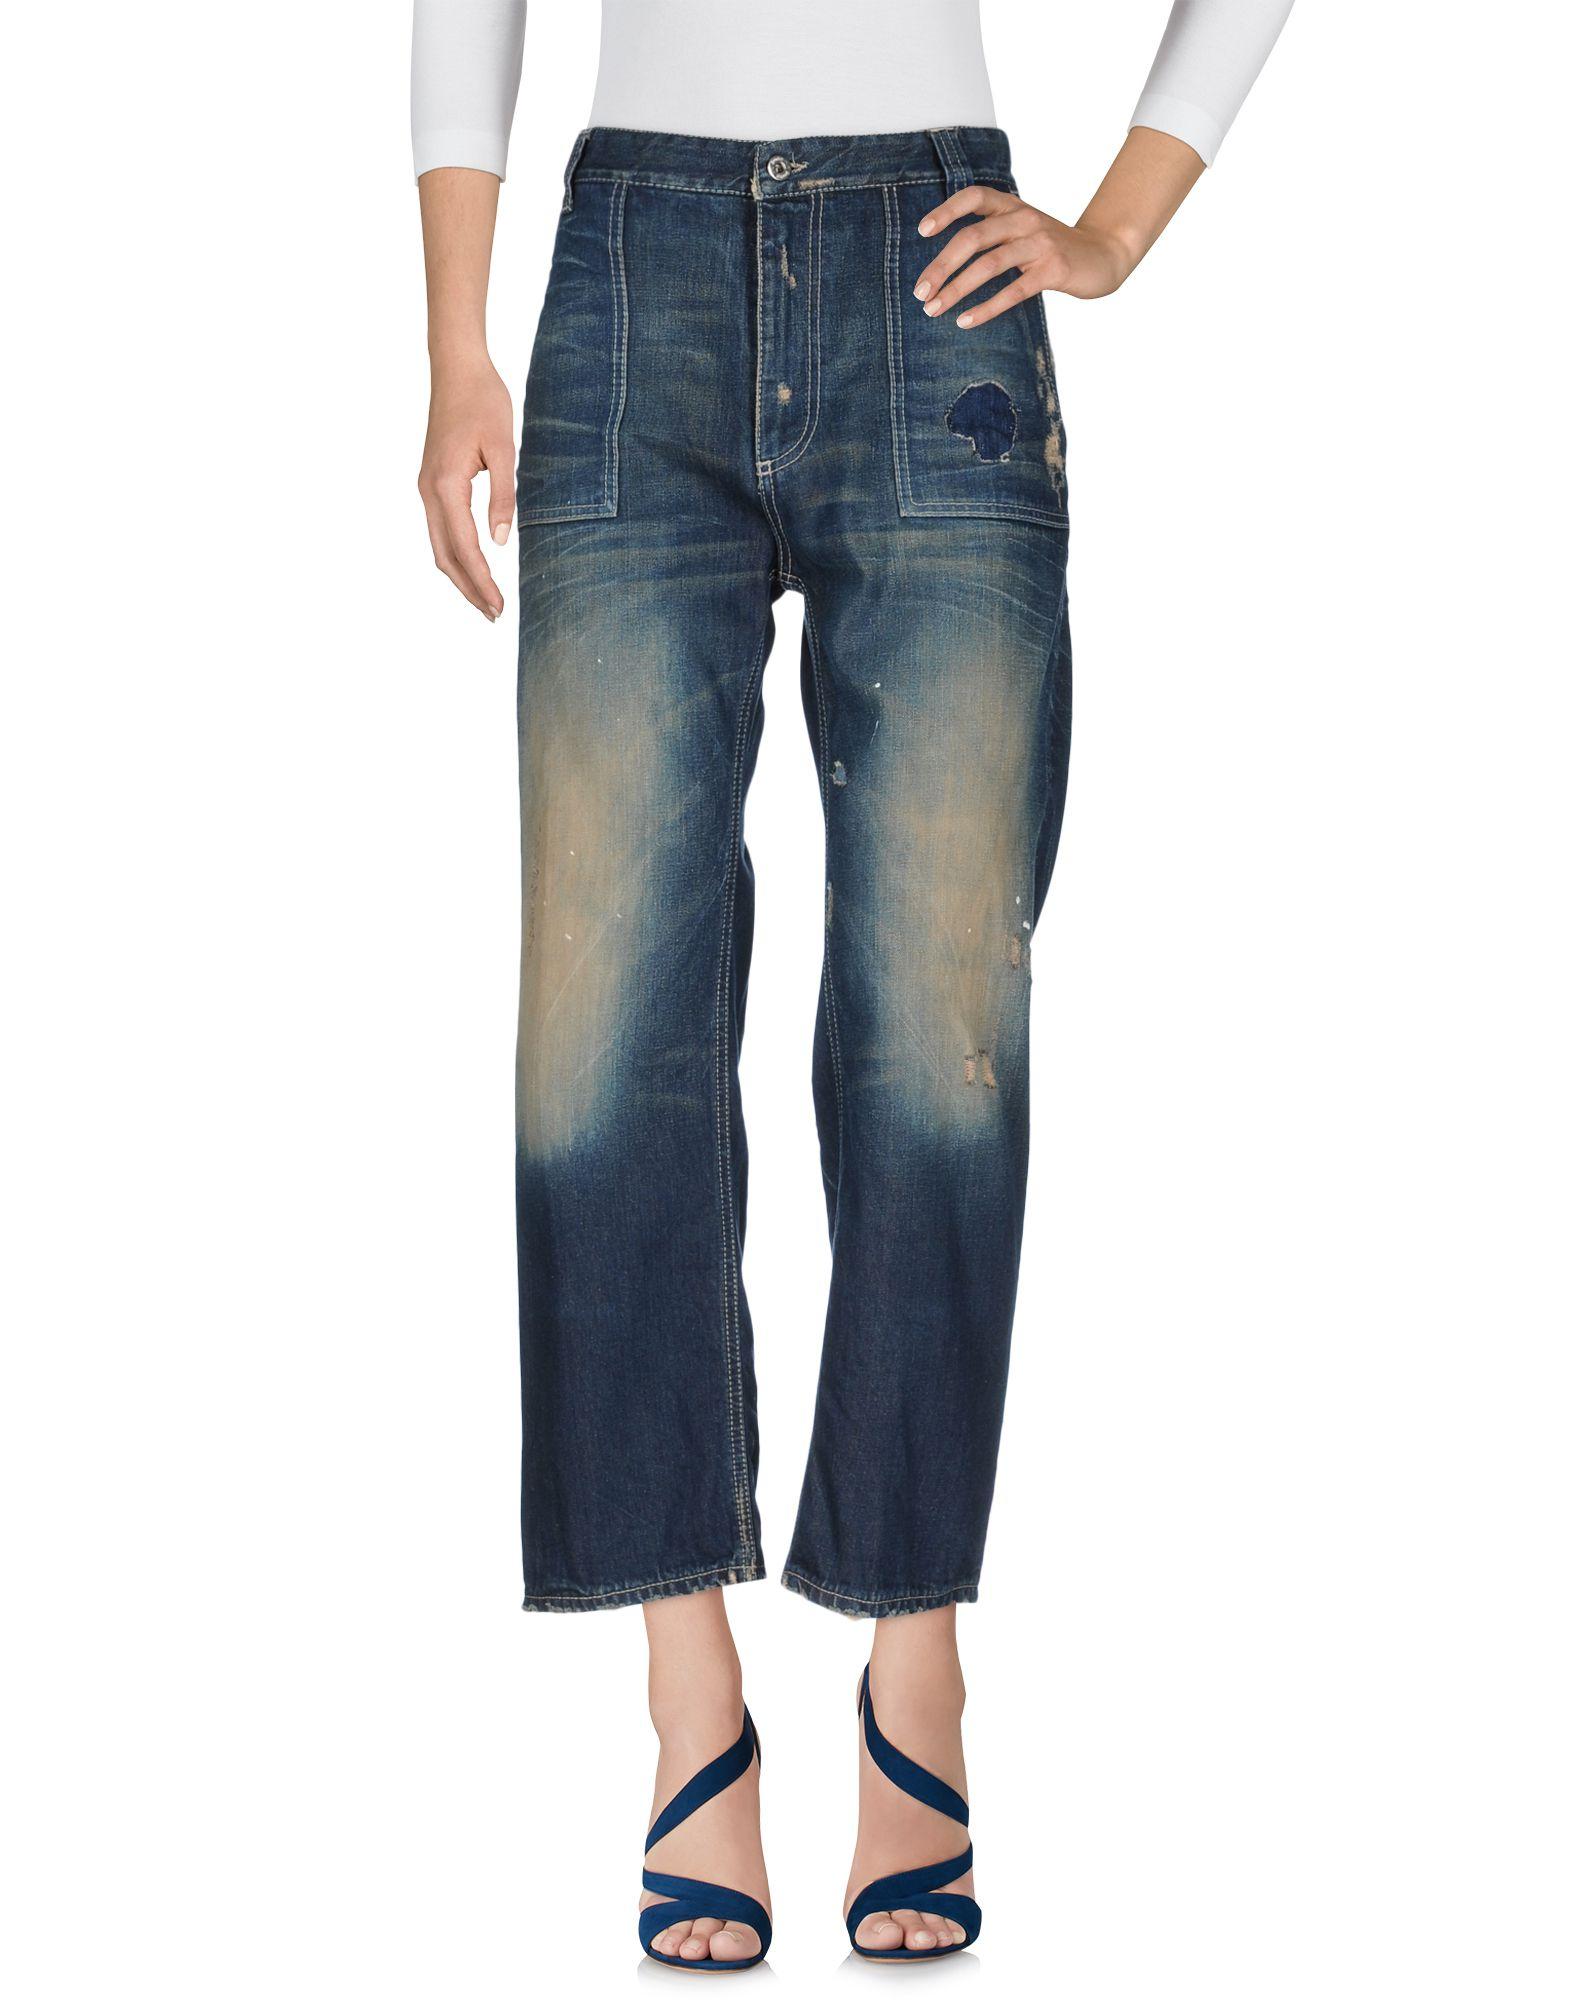 Pantaloni Jeans Dondup Donna - Acquista online su fMfq3H